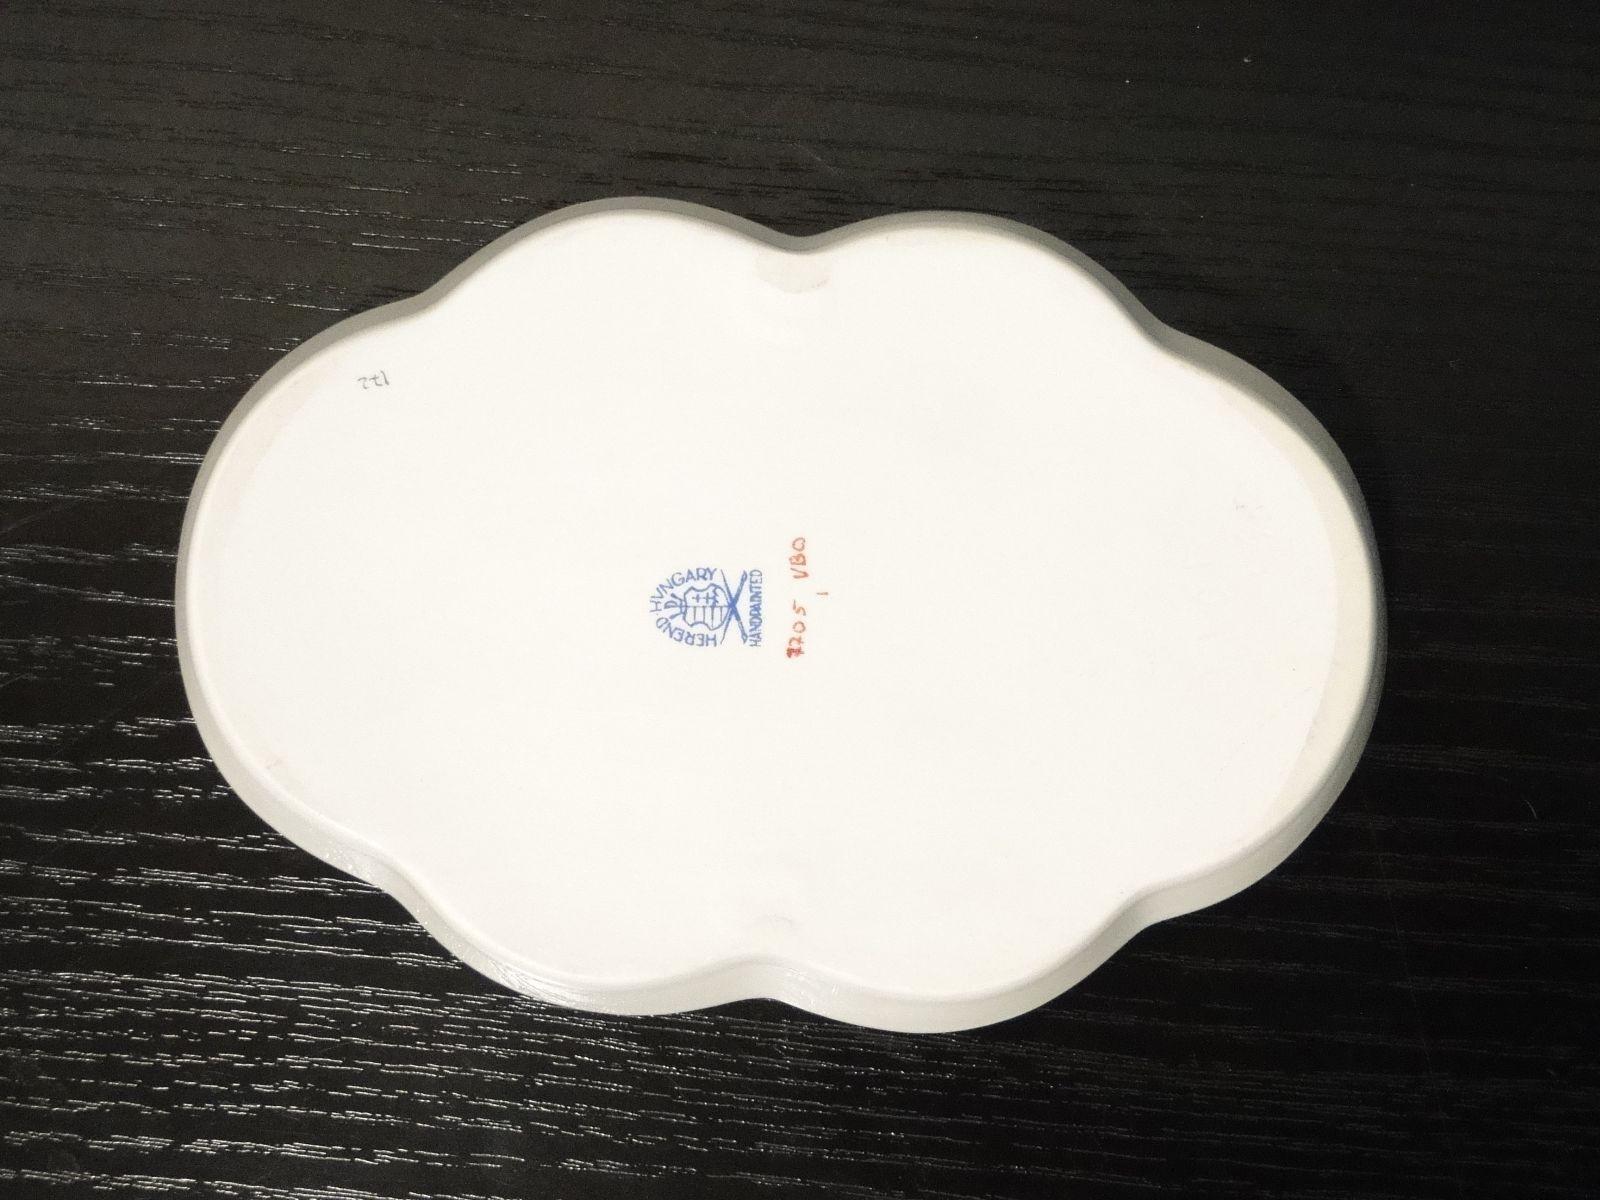 DSC07080.JPG (1600�1200)